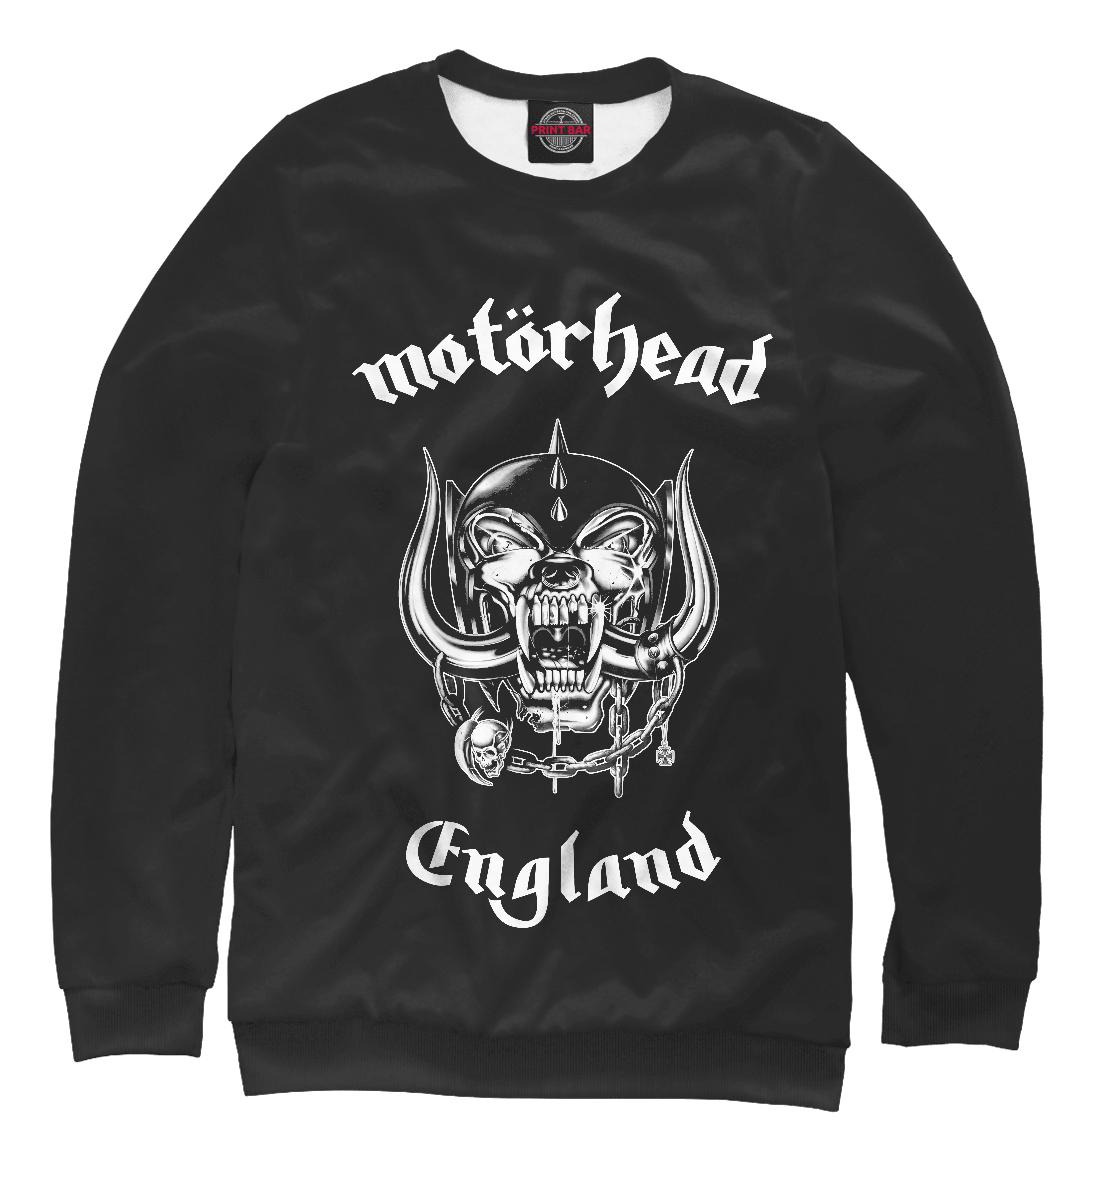 Купить Motorhead, Printbar, Свитшоты, MOT-604278-swi-1